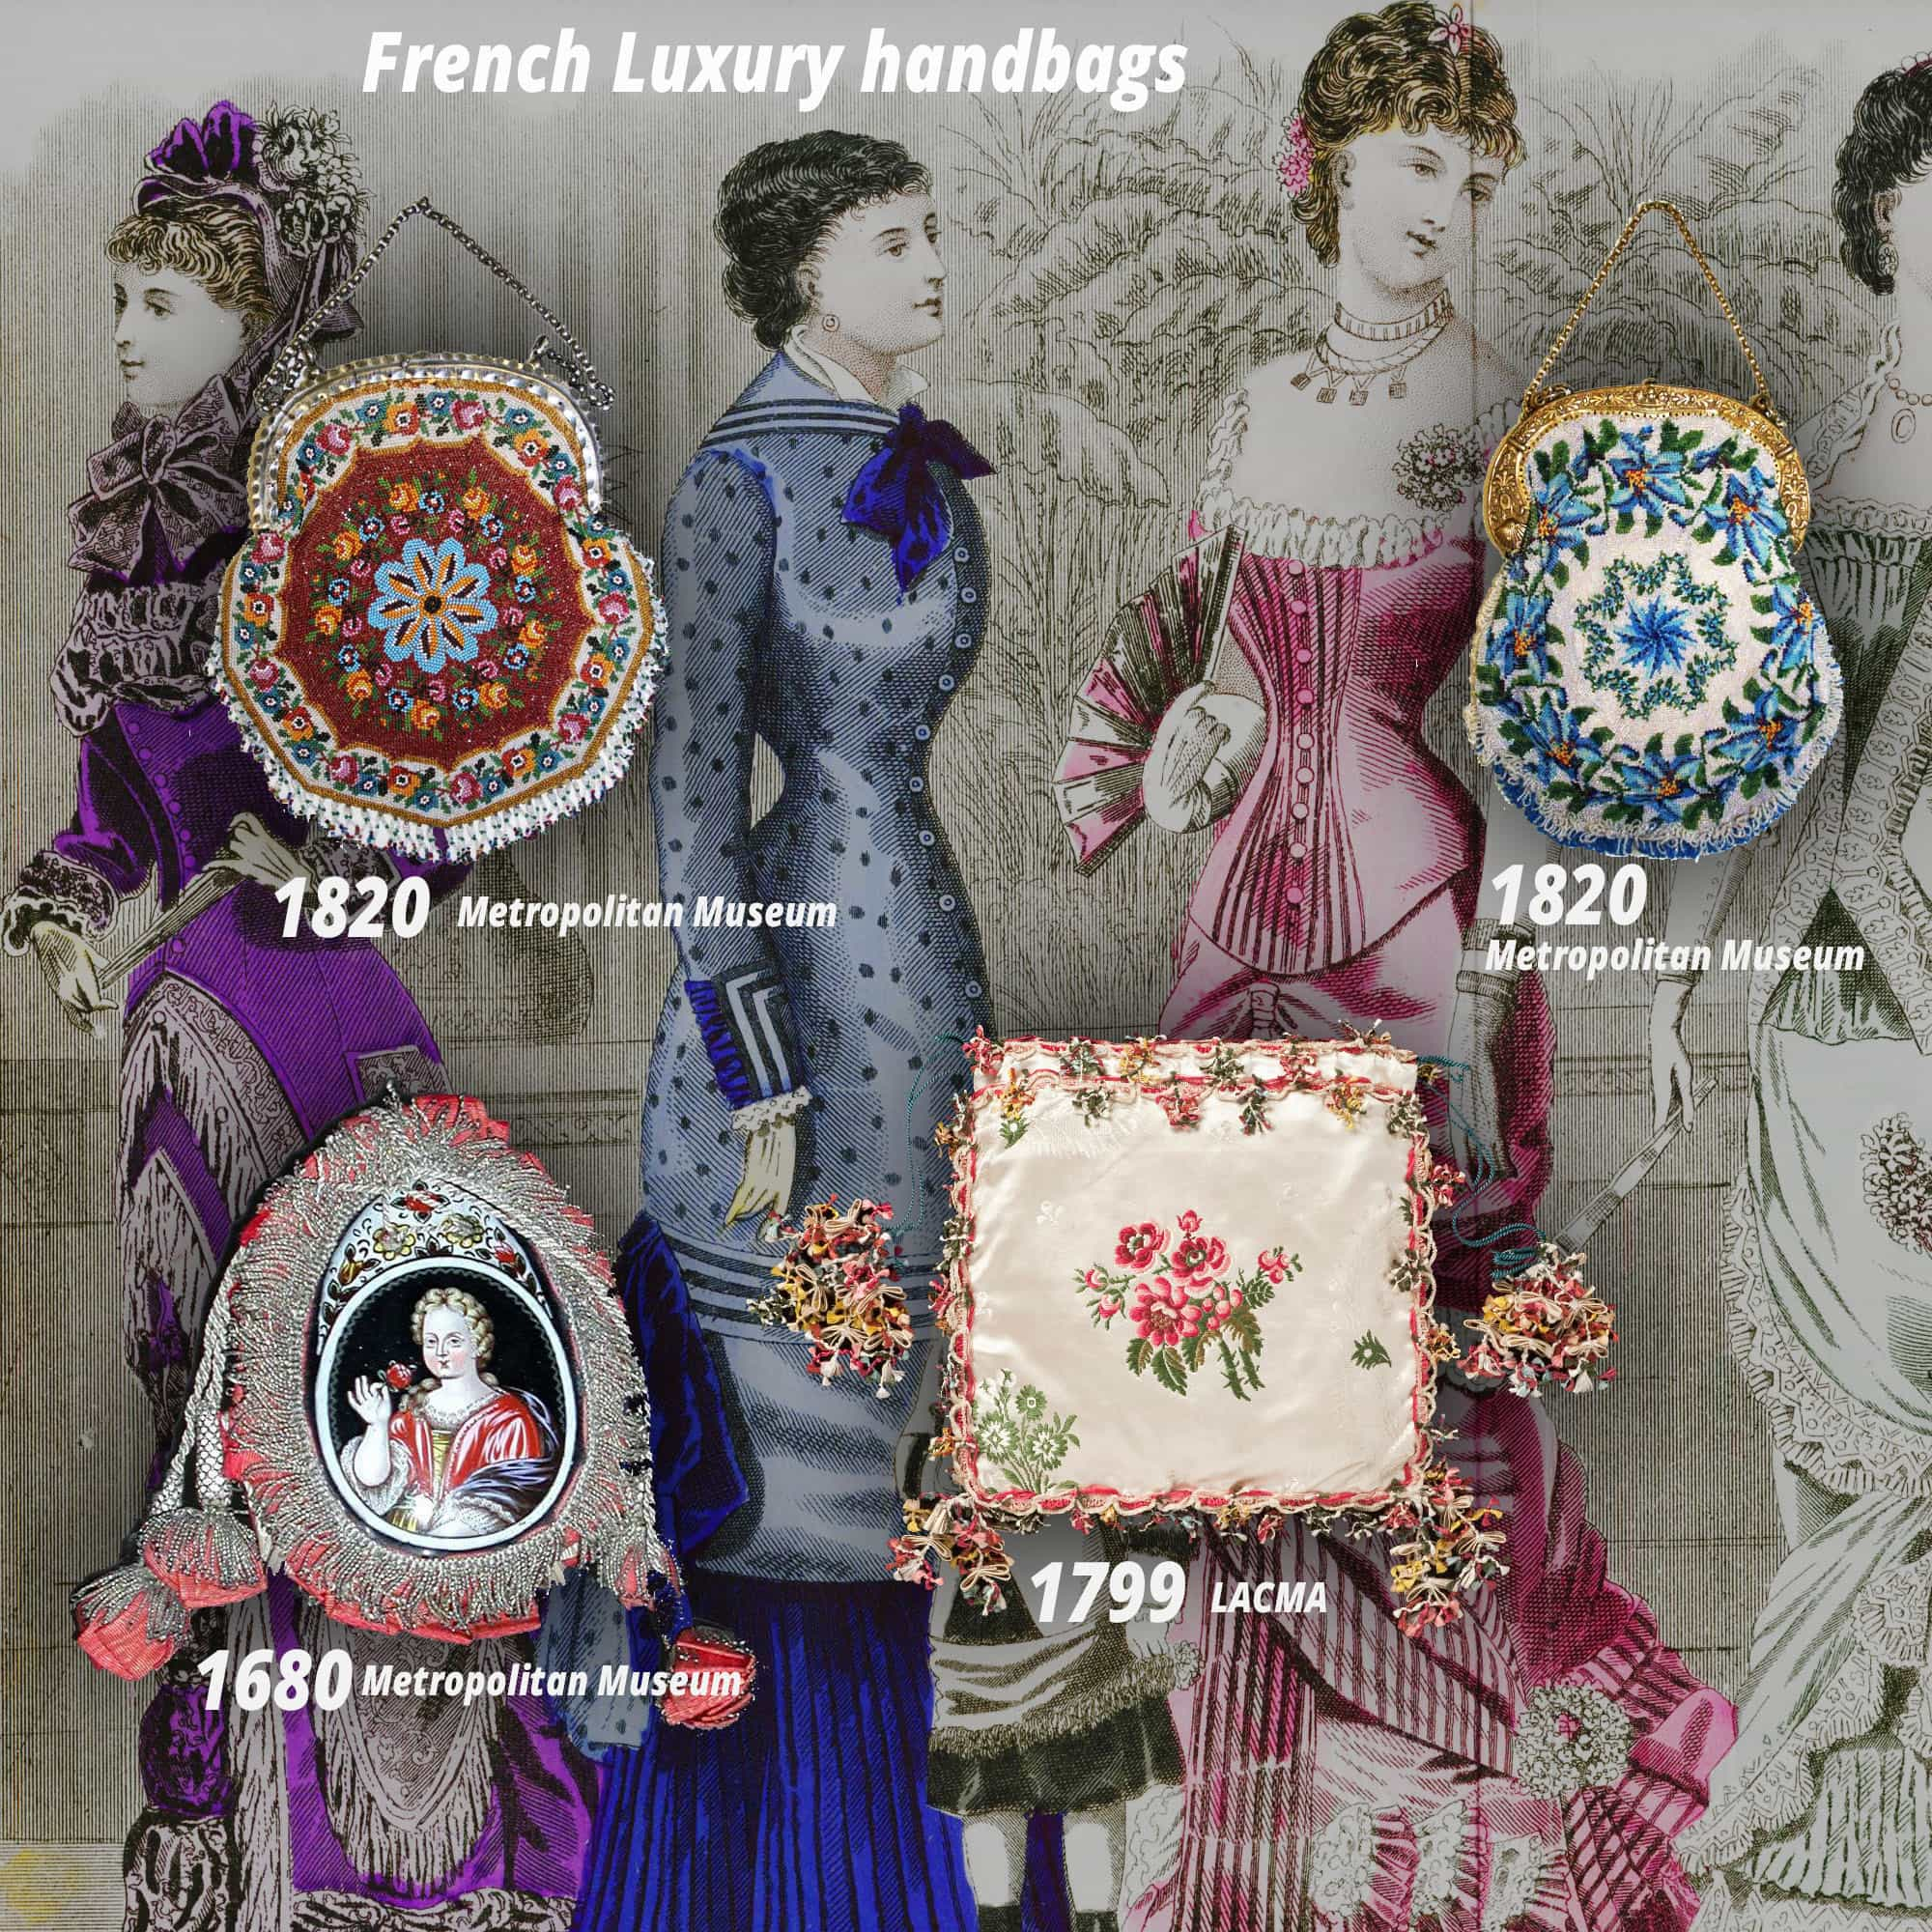 History of handbag - INPI treasures - French handbags from 1680-1820 - Metropolitan Museum